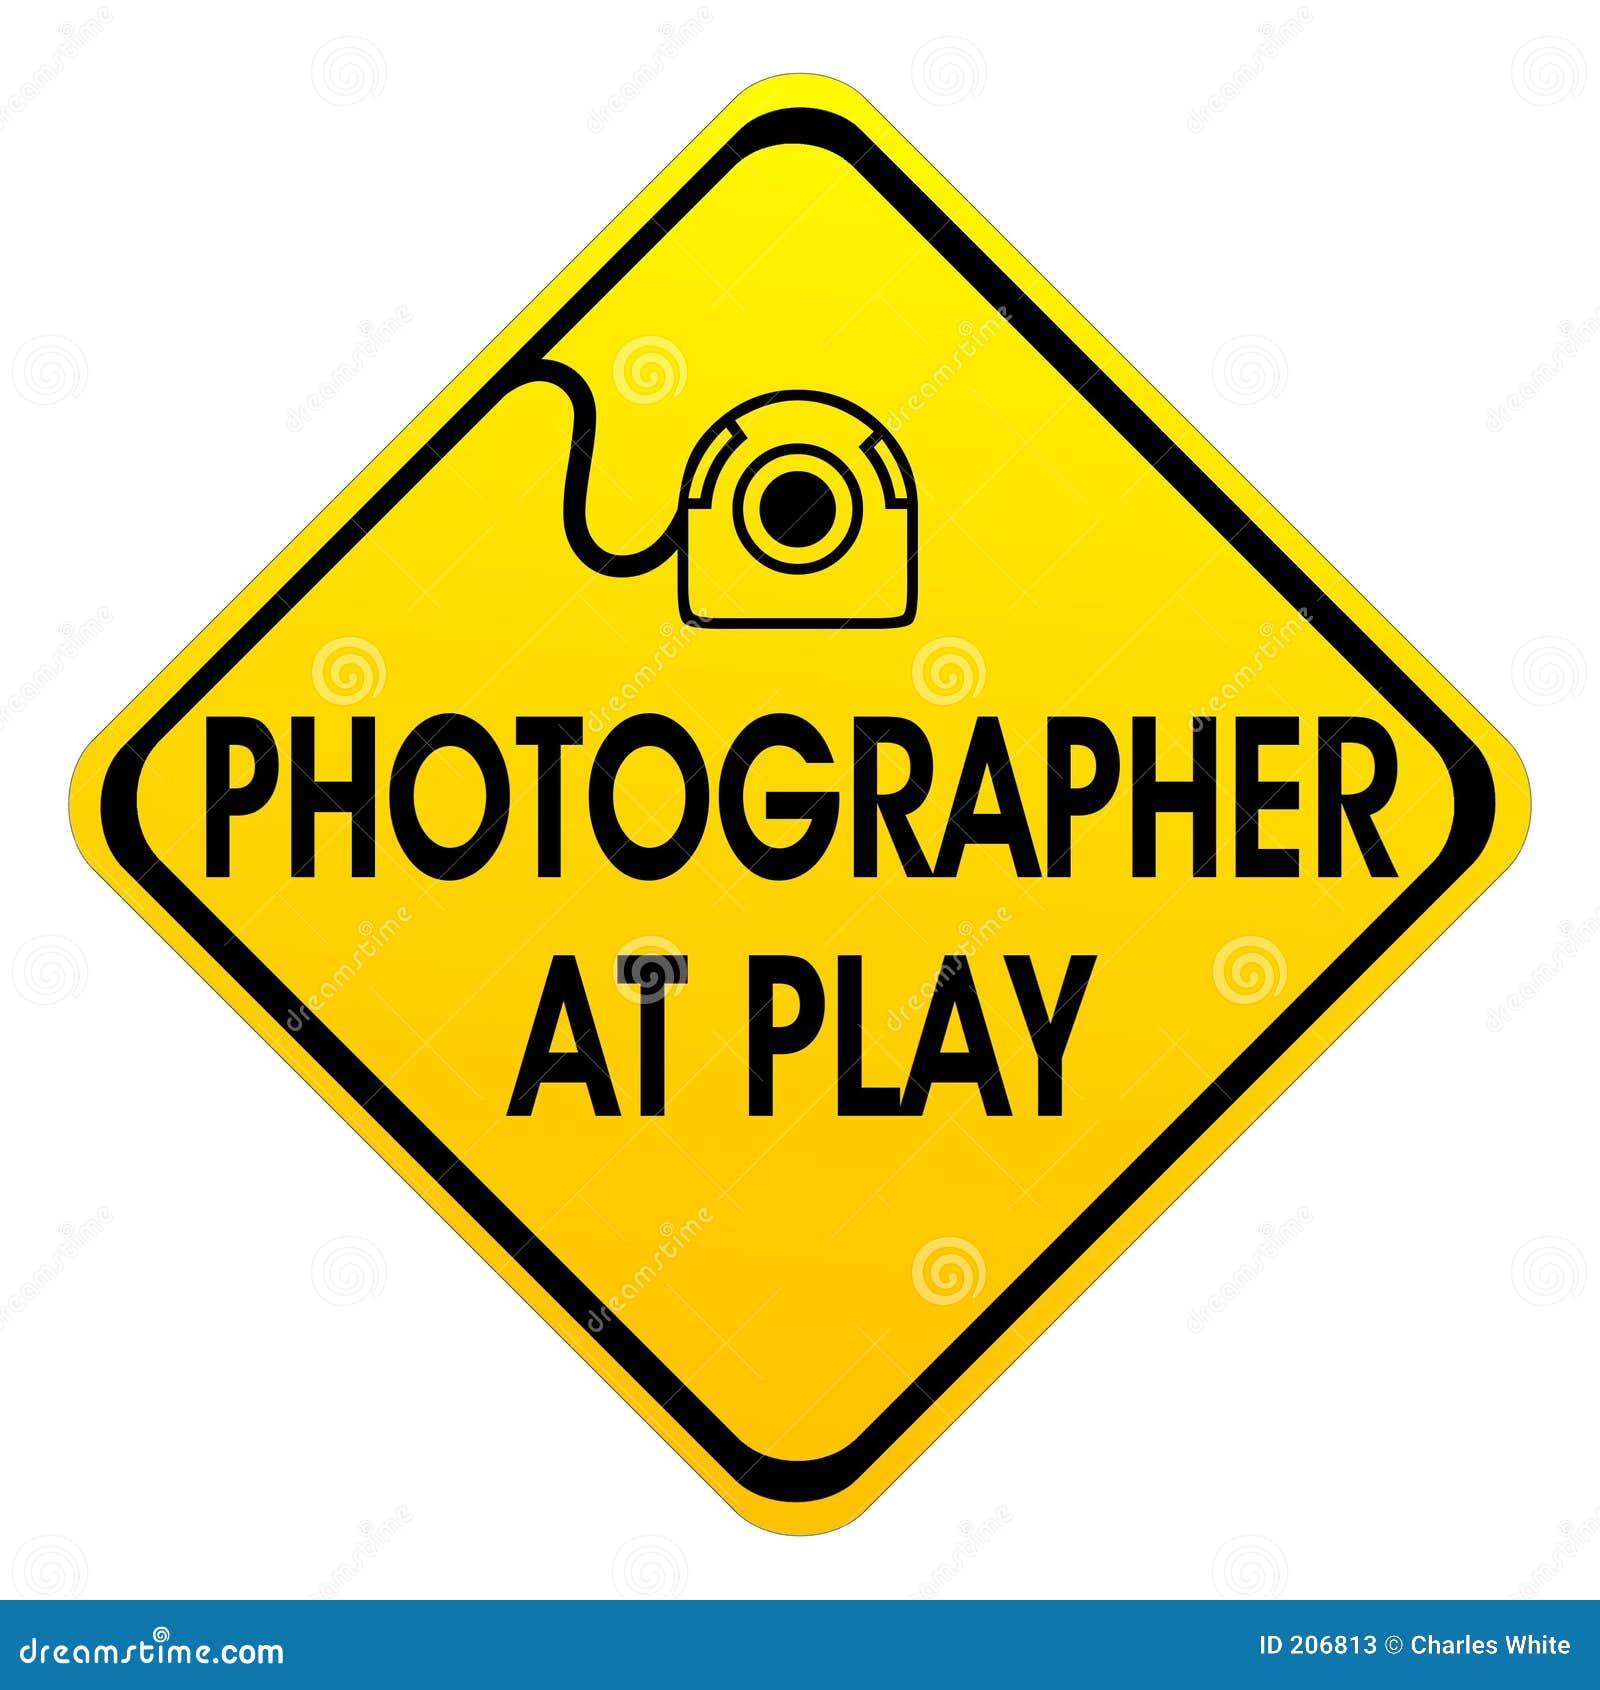 Photogarpherspelrum